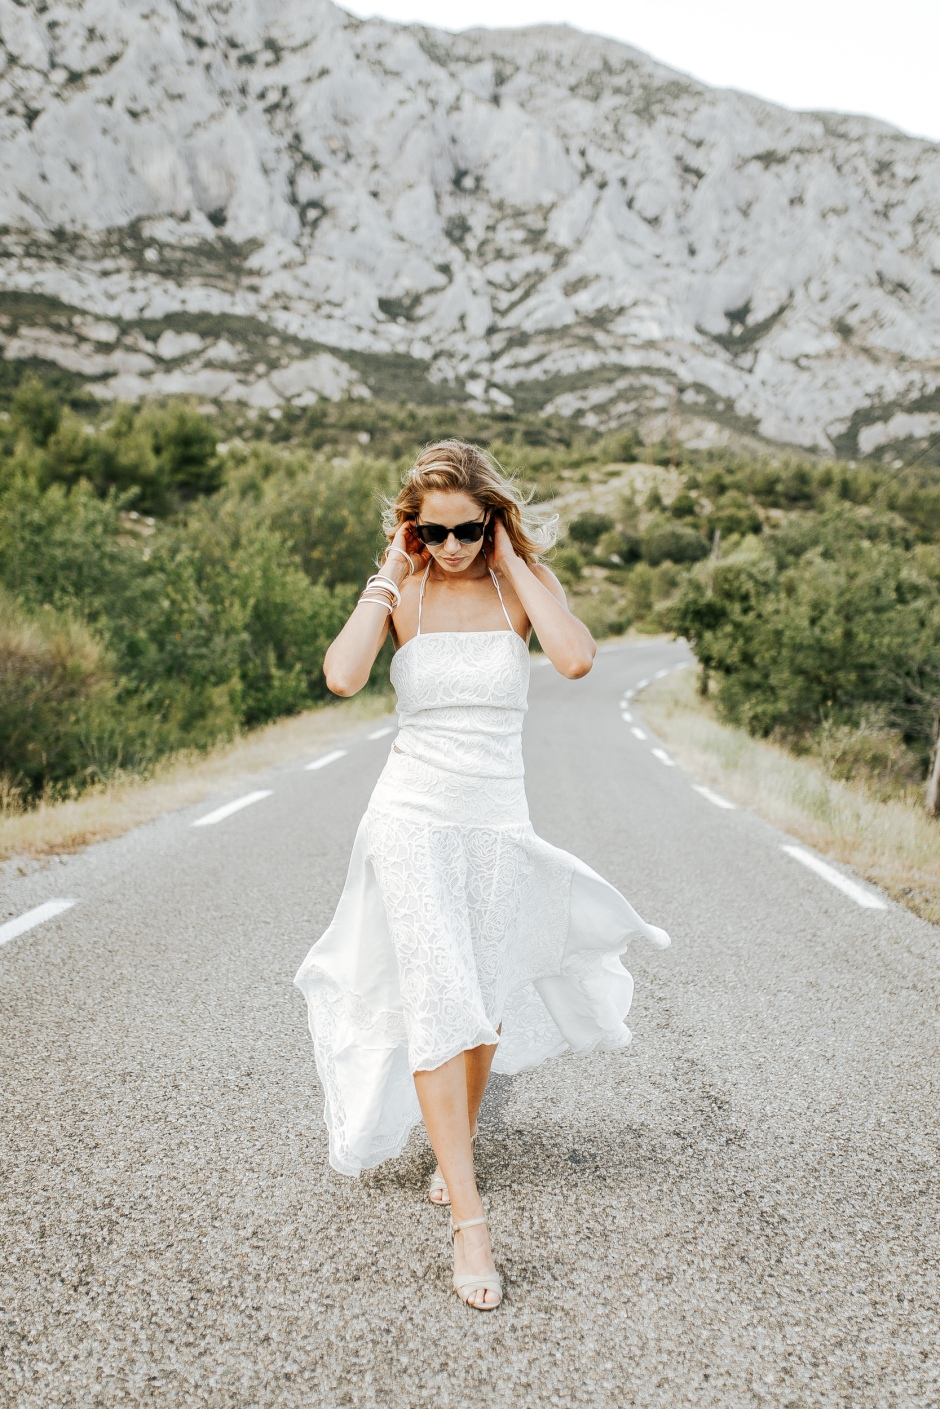 elisa-ness-la-blogueuse-mariage-34